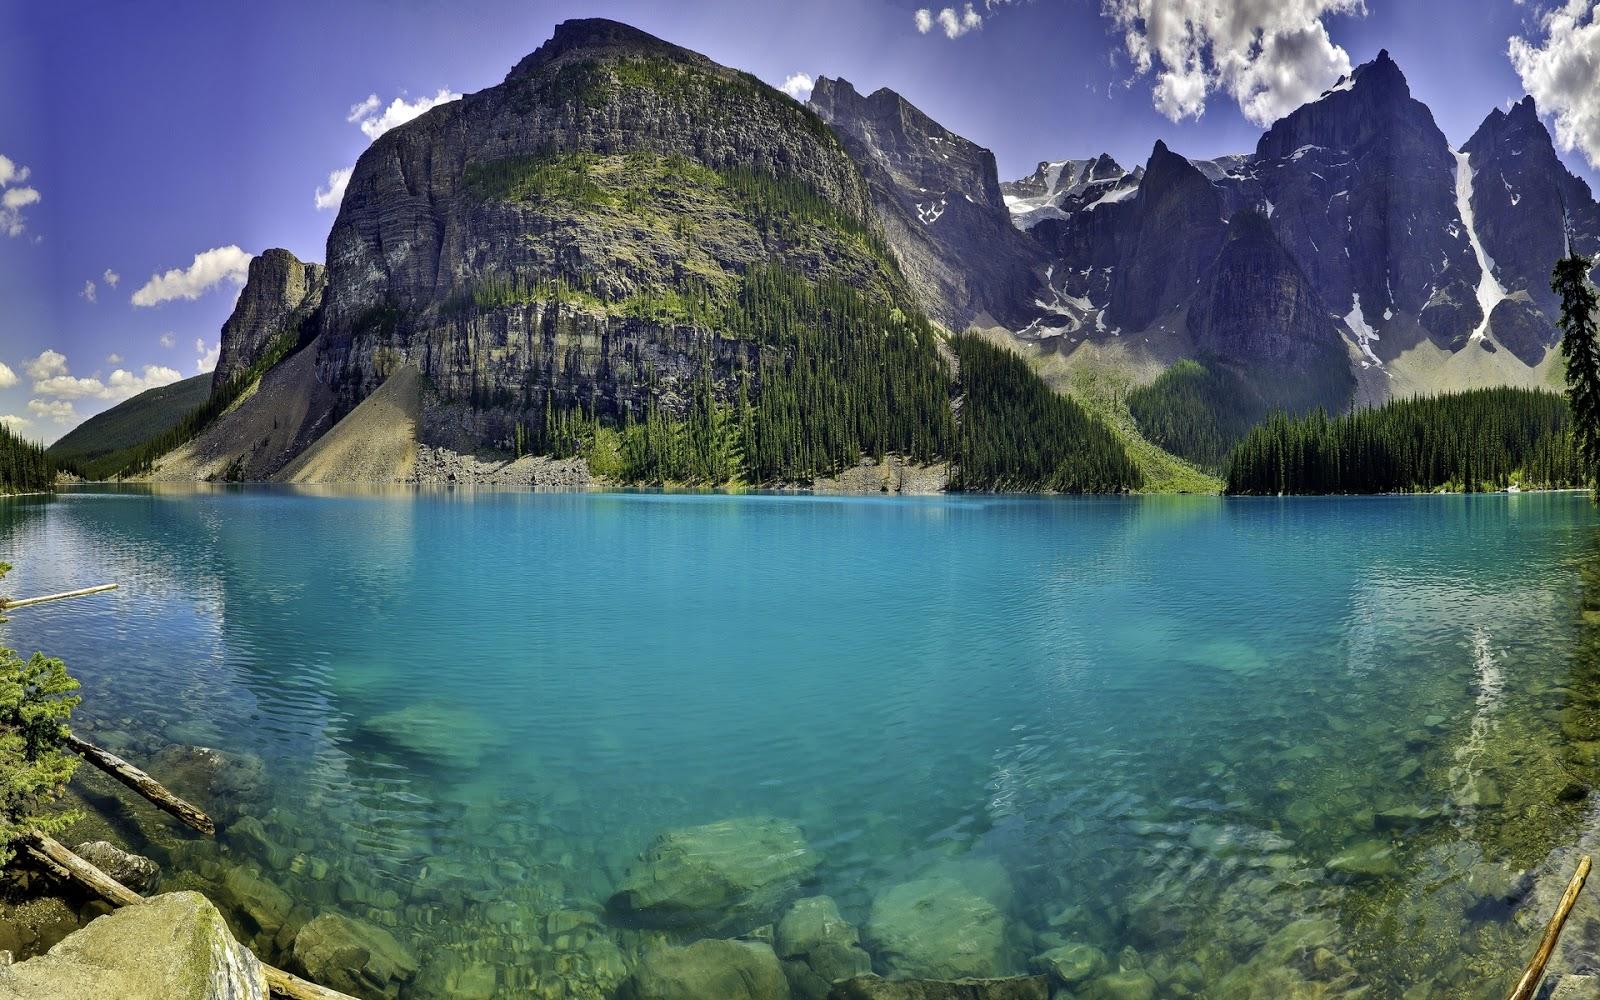 http://3.bp.blogspot.com/-xJKfH_GojcE/UJmy6ZrzrKI/AAAAAAAACVU/PwEcb05d7hI/s1600/Moraine+Lake+in+Canada+nature+wallpaper+(1920+x+1200).jpg